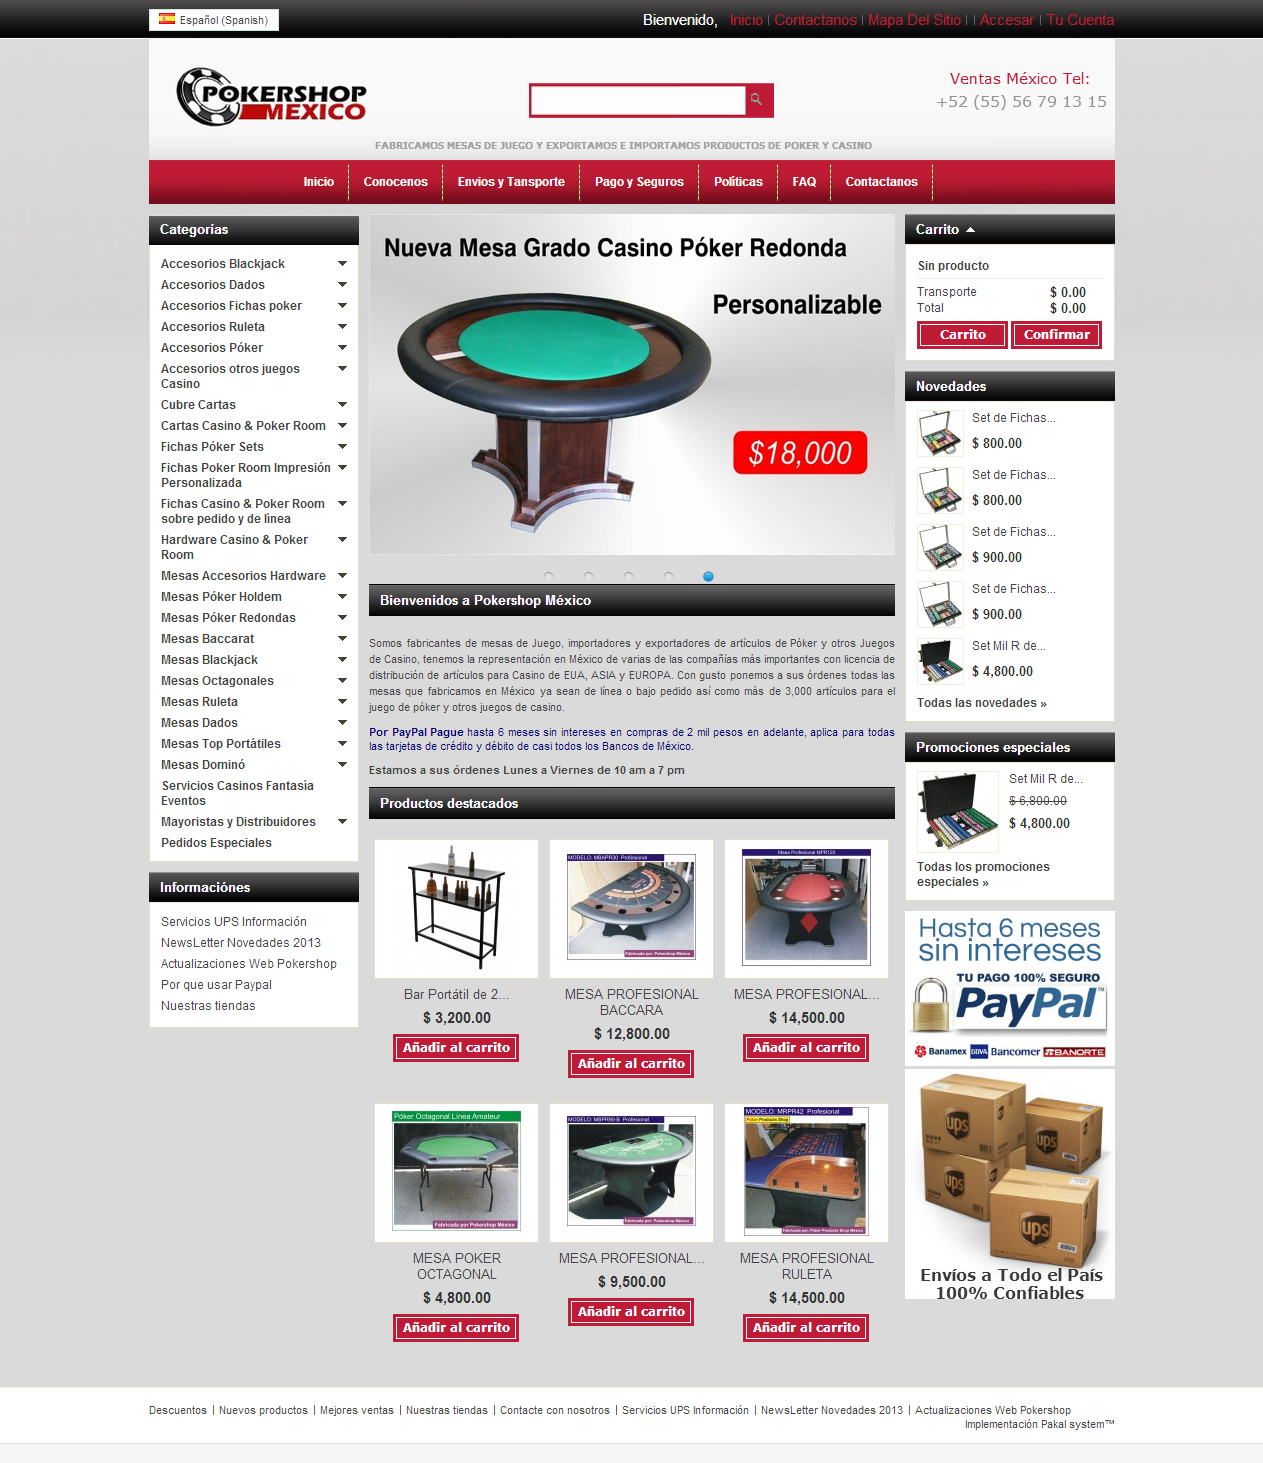 Tienda virtual poker de las americas